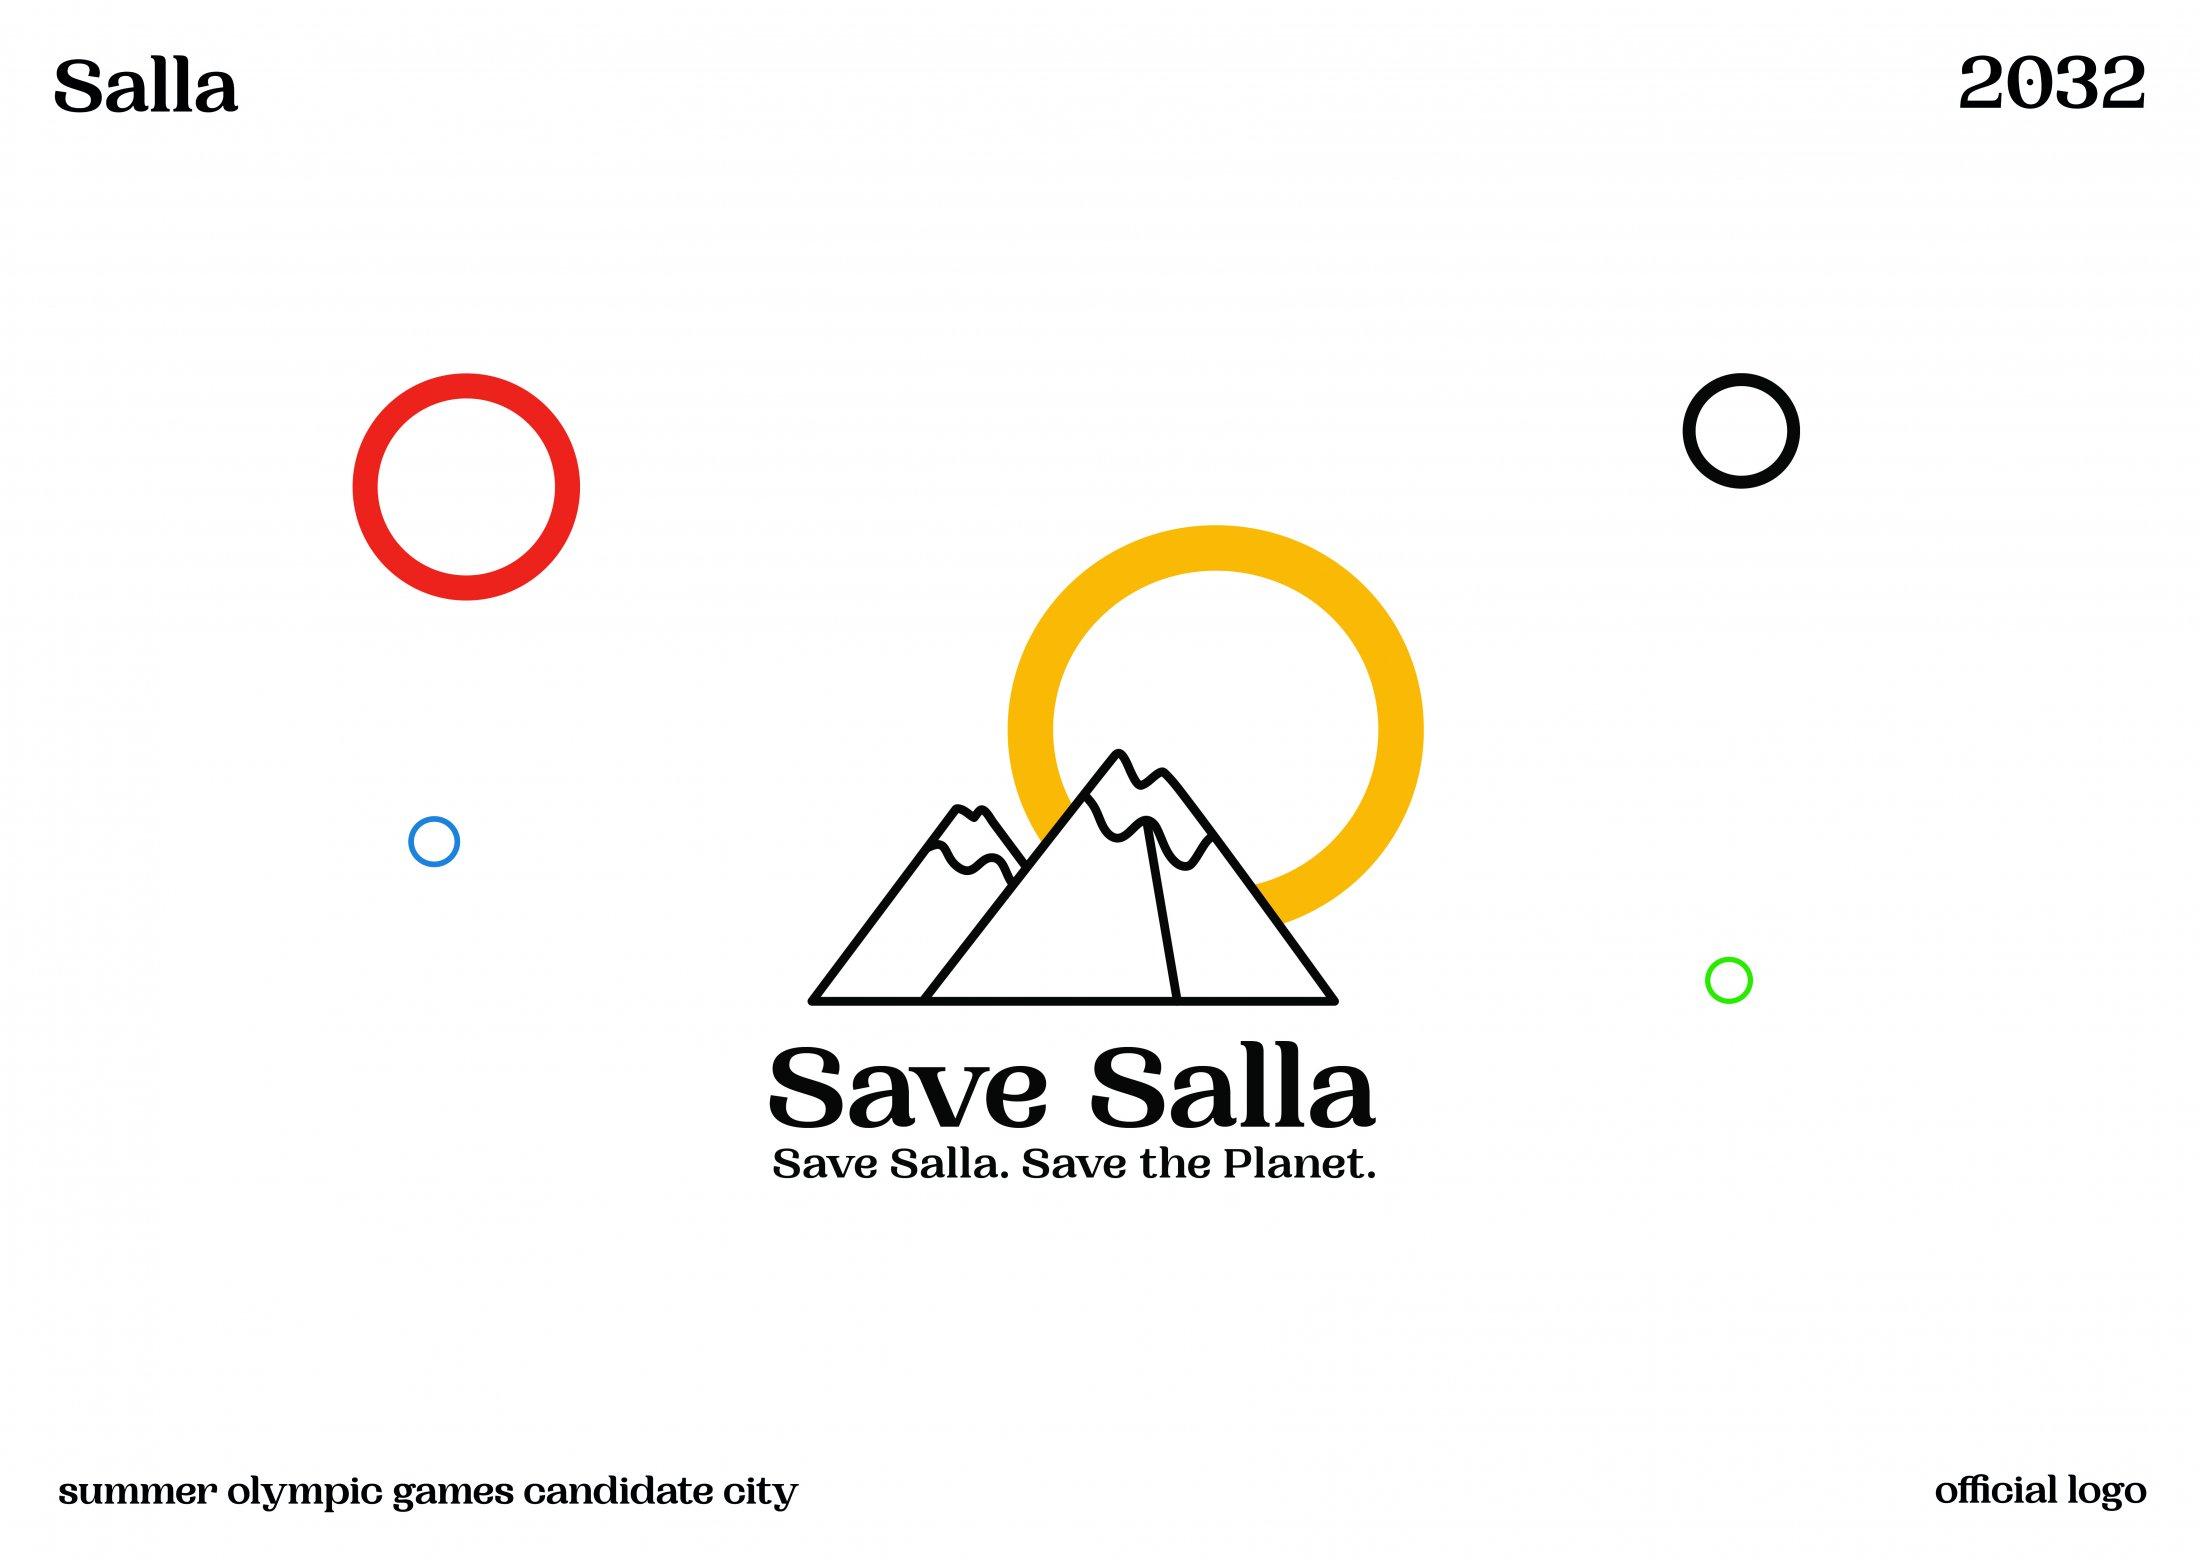 Thumbnail for Salla 2032